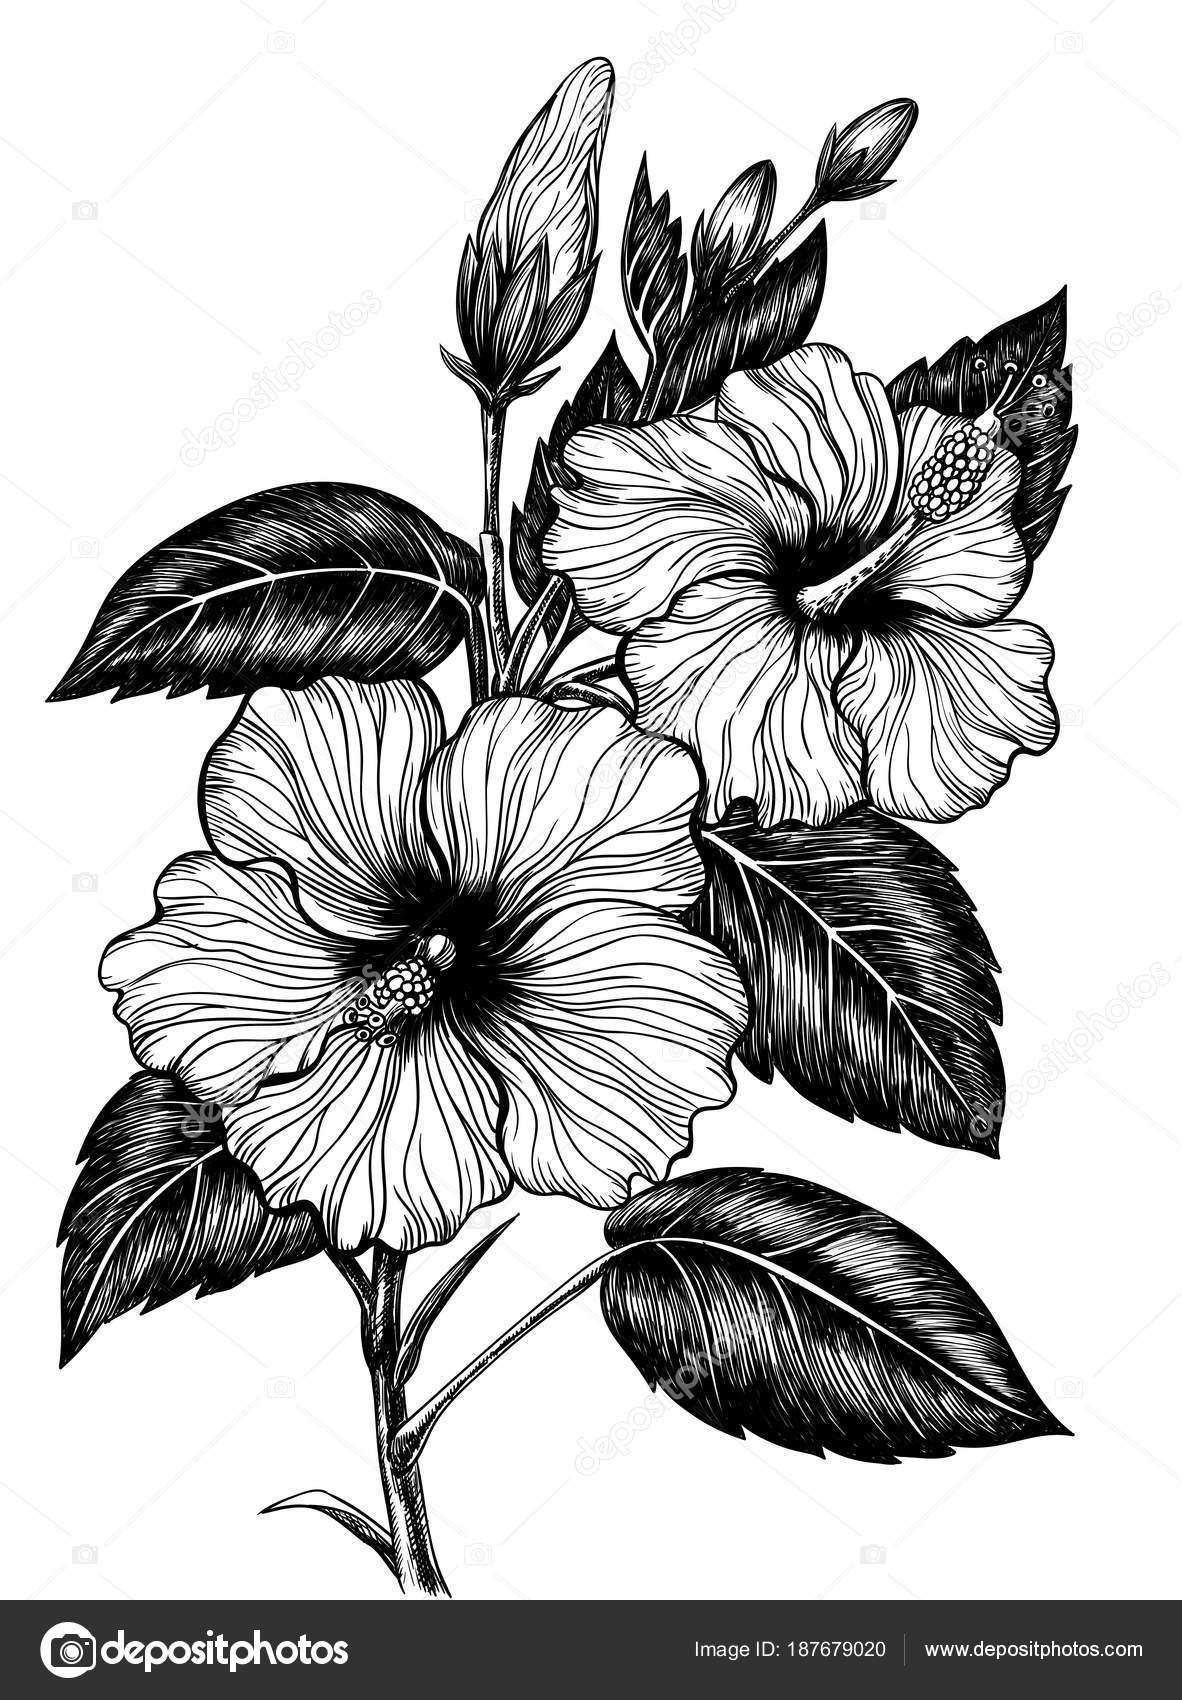 Hibiscus flower drawing stock vector katerinamk 187679020 hibiscus flower drawing stock vector izmirmasajfo